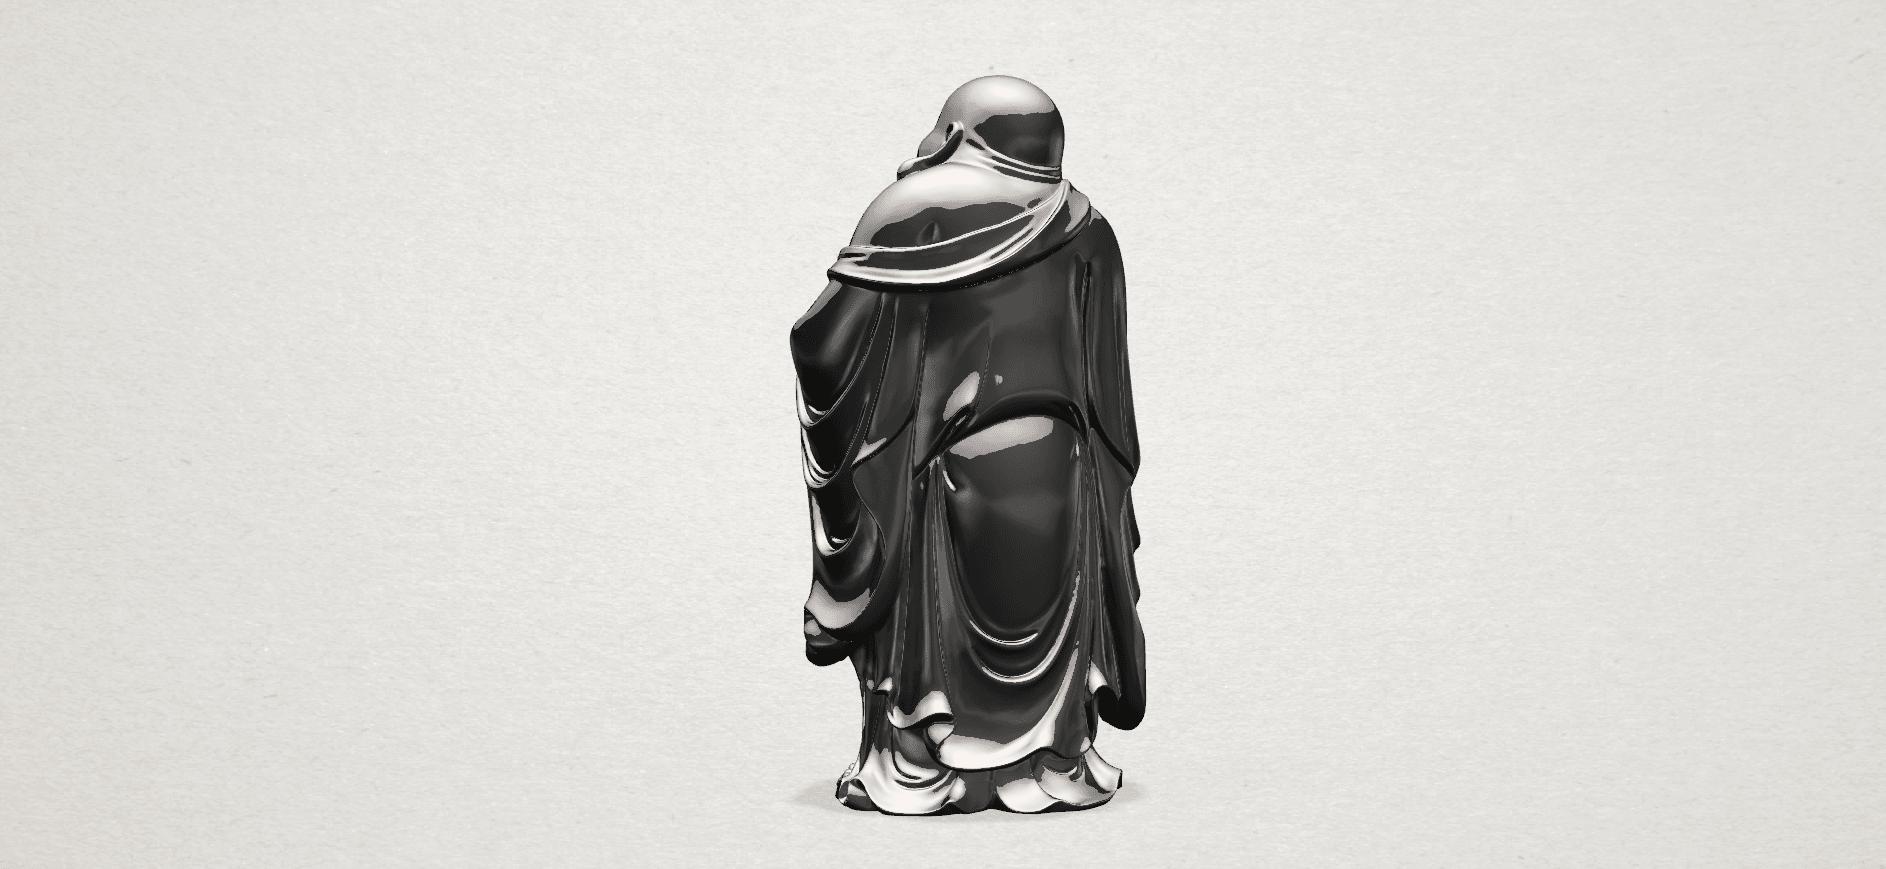 TDA0070 Metteyya Buddha 01 - 88mm - B04.png Download free STL file Metteyya Buddha 01 • 3D print object, GeorgesNikkei